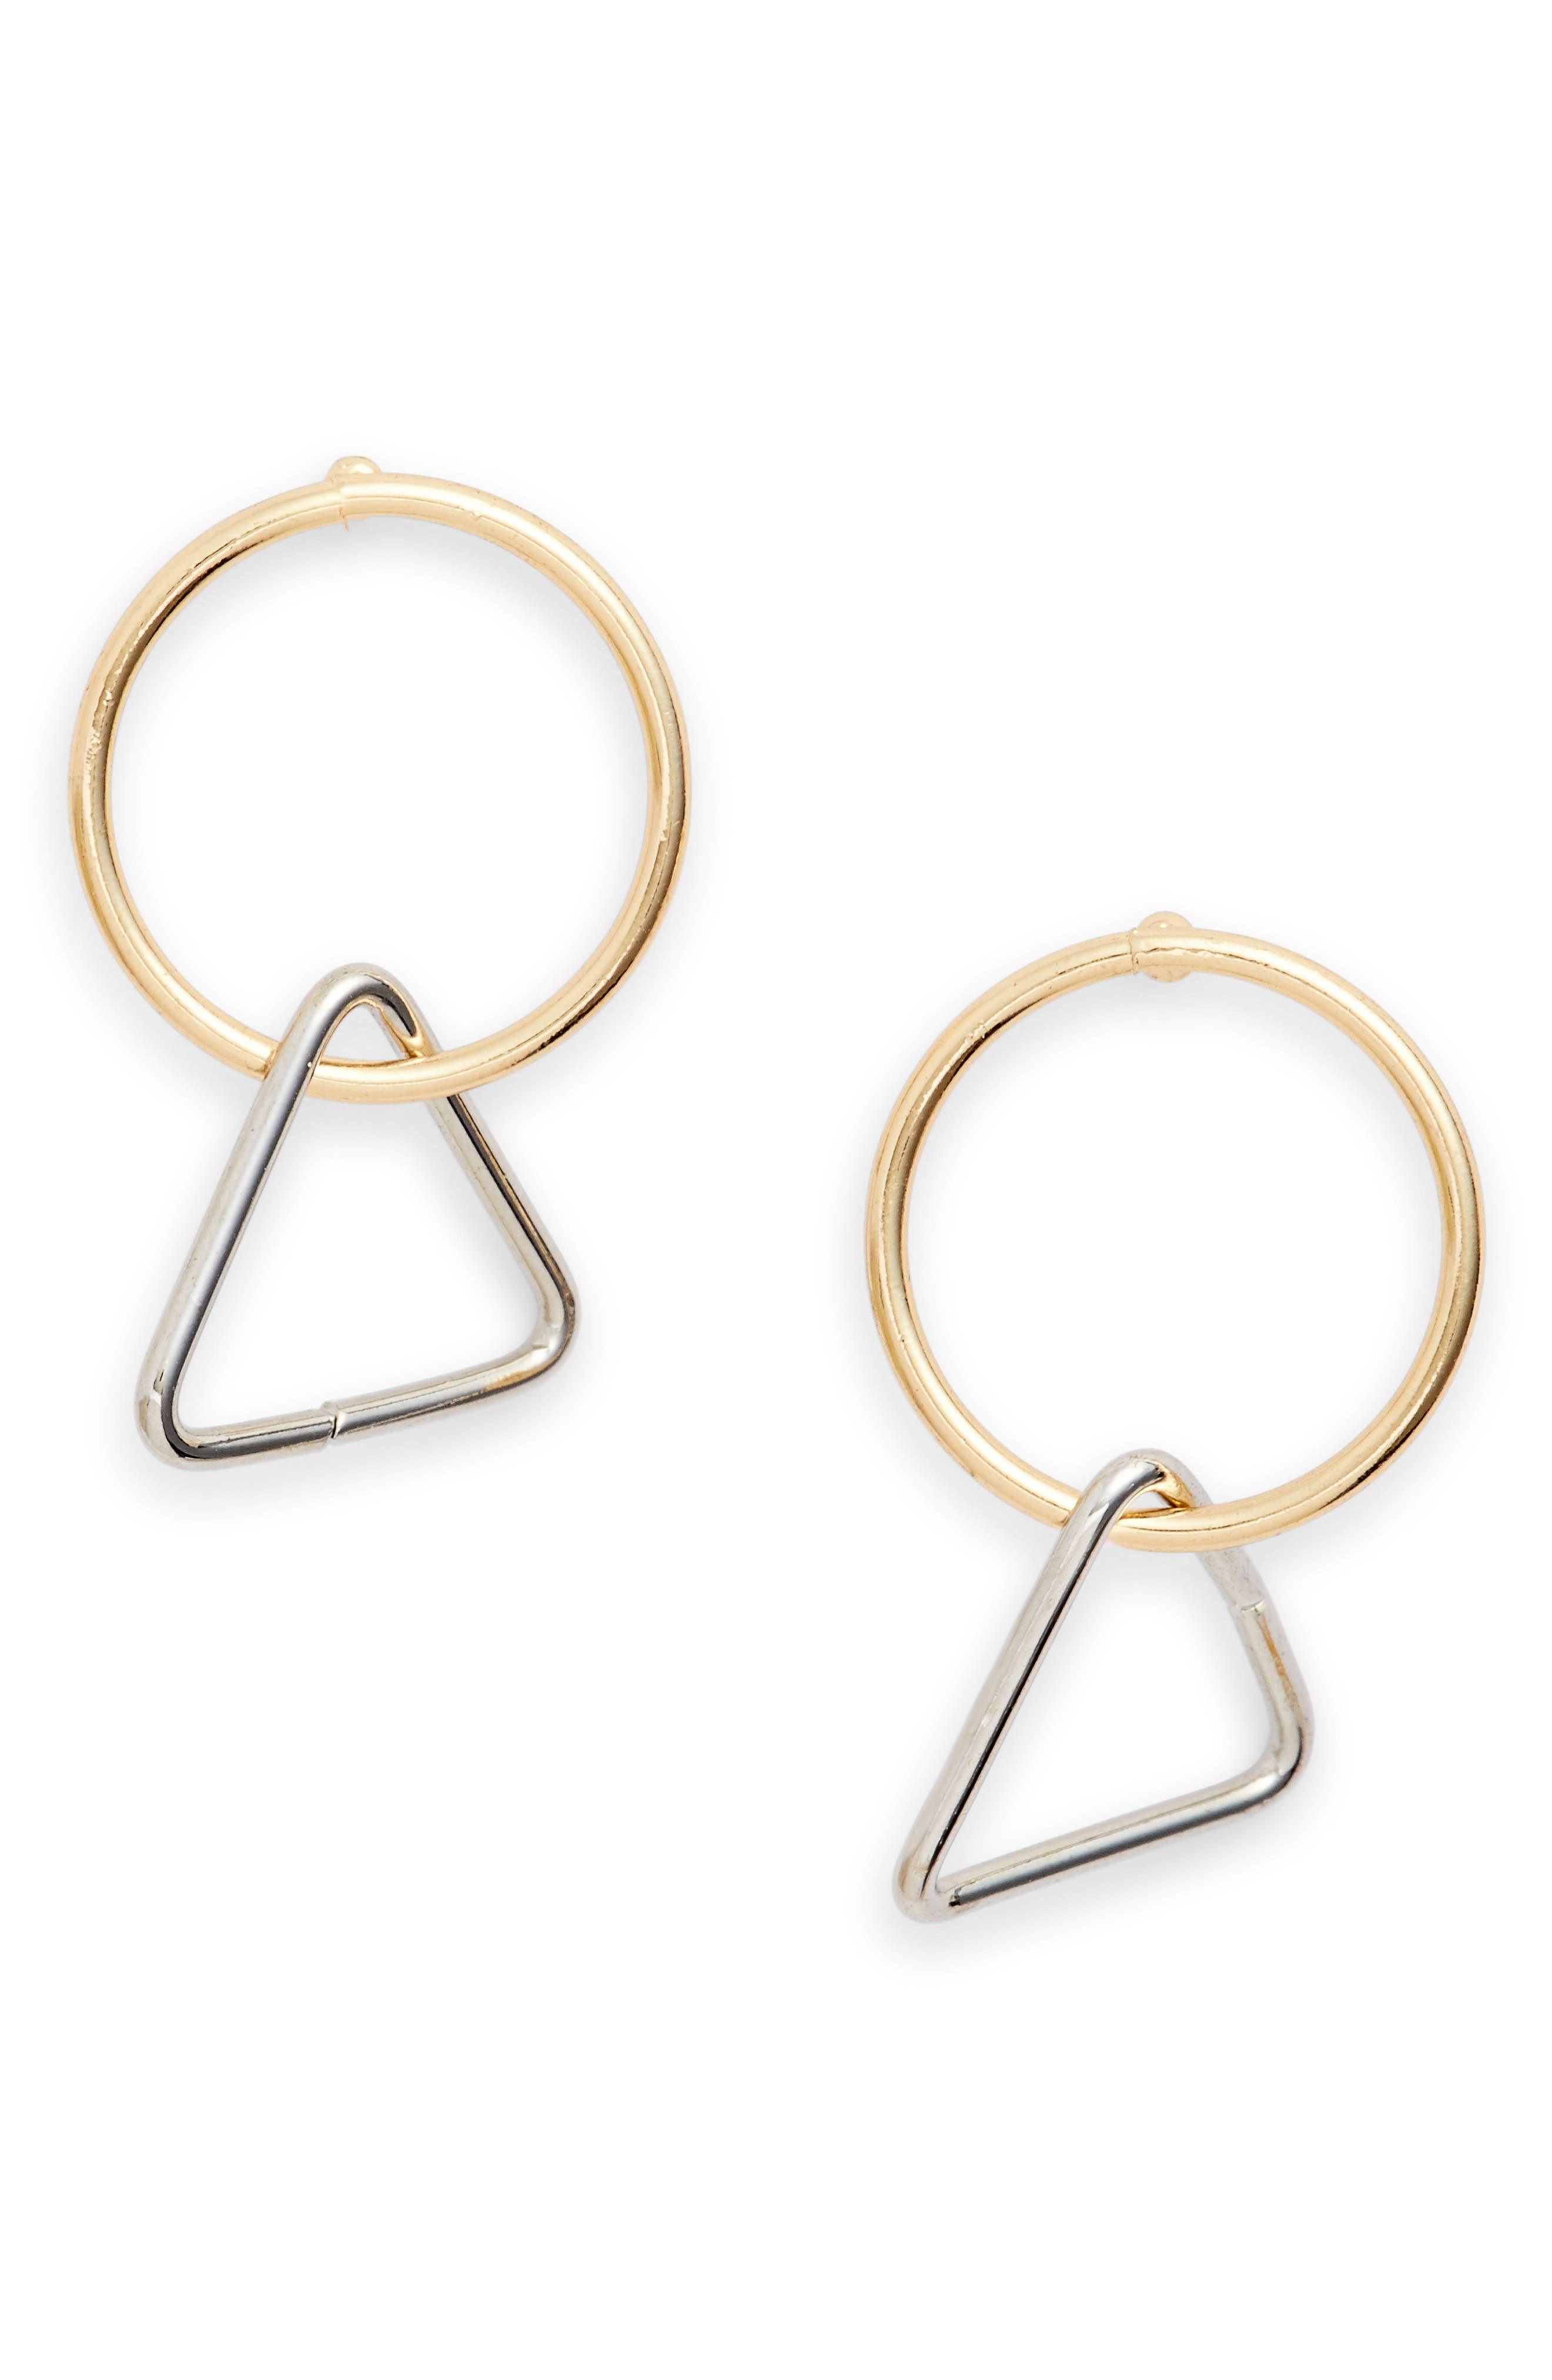 Mini Triangle Hoop Earrings,                         Main,                         color, GOLD/ SILVER